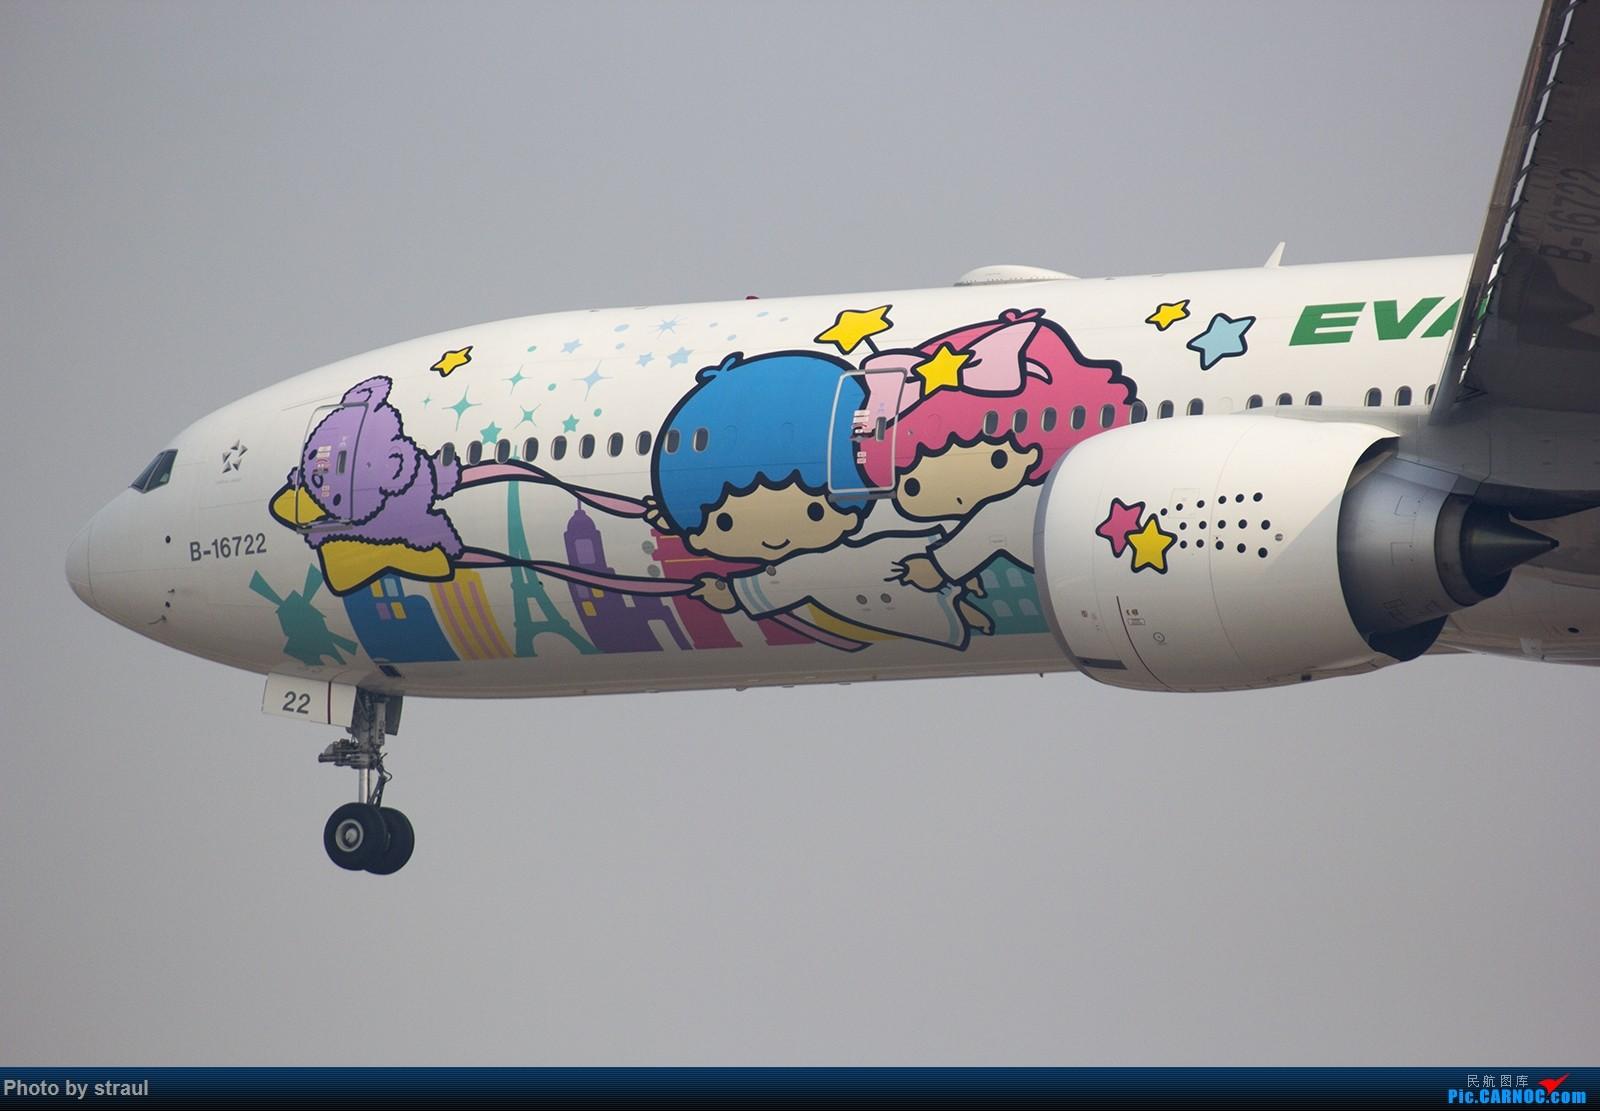 Re:[原创]「好几张图」长荣喵机之星空(B-16722)今日来到了北京 BOEING 777-300ER B-16722 中国北京首都国际机场